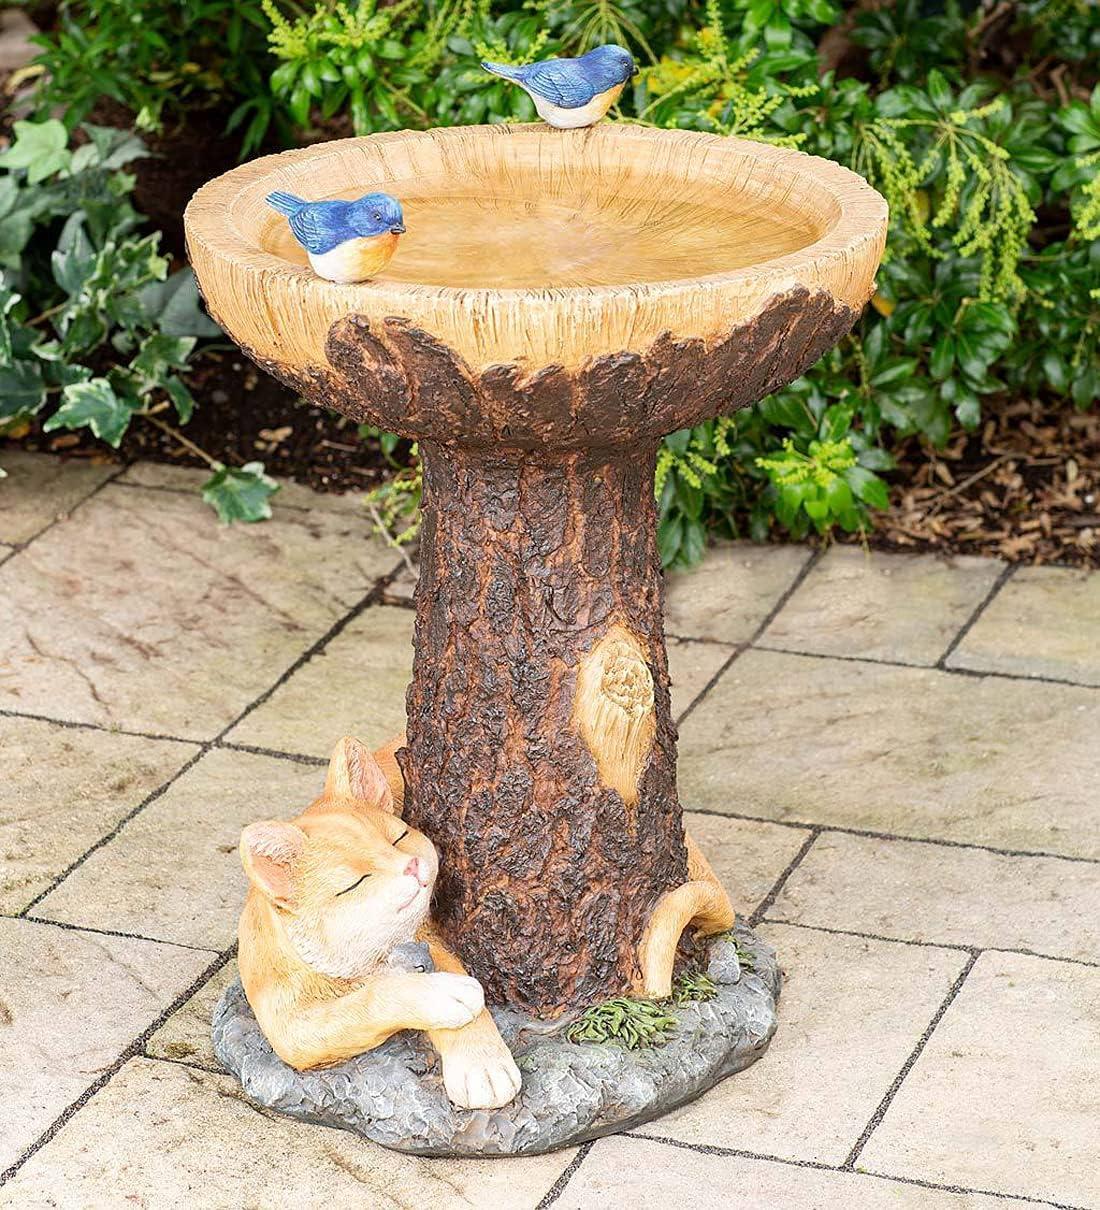 祝開店大放出セール開催中 Creative Fairies Handmade Brown Pedestal for 品質検査済 Outdoor - Bath Bird